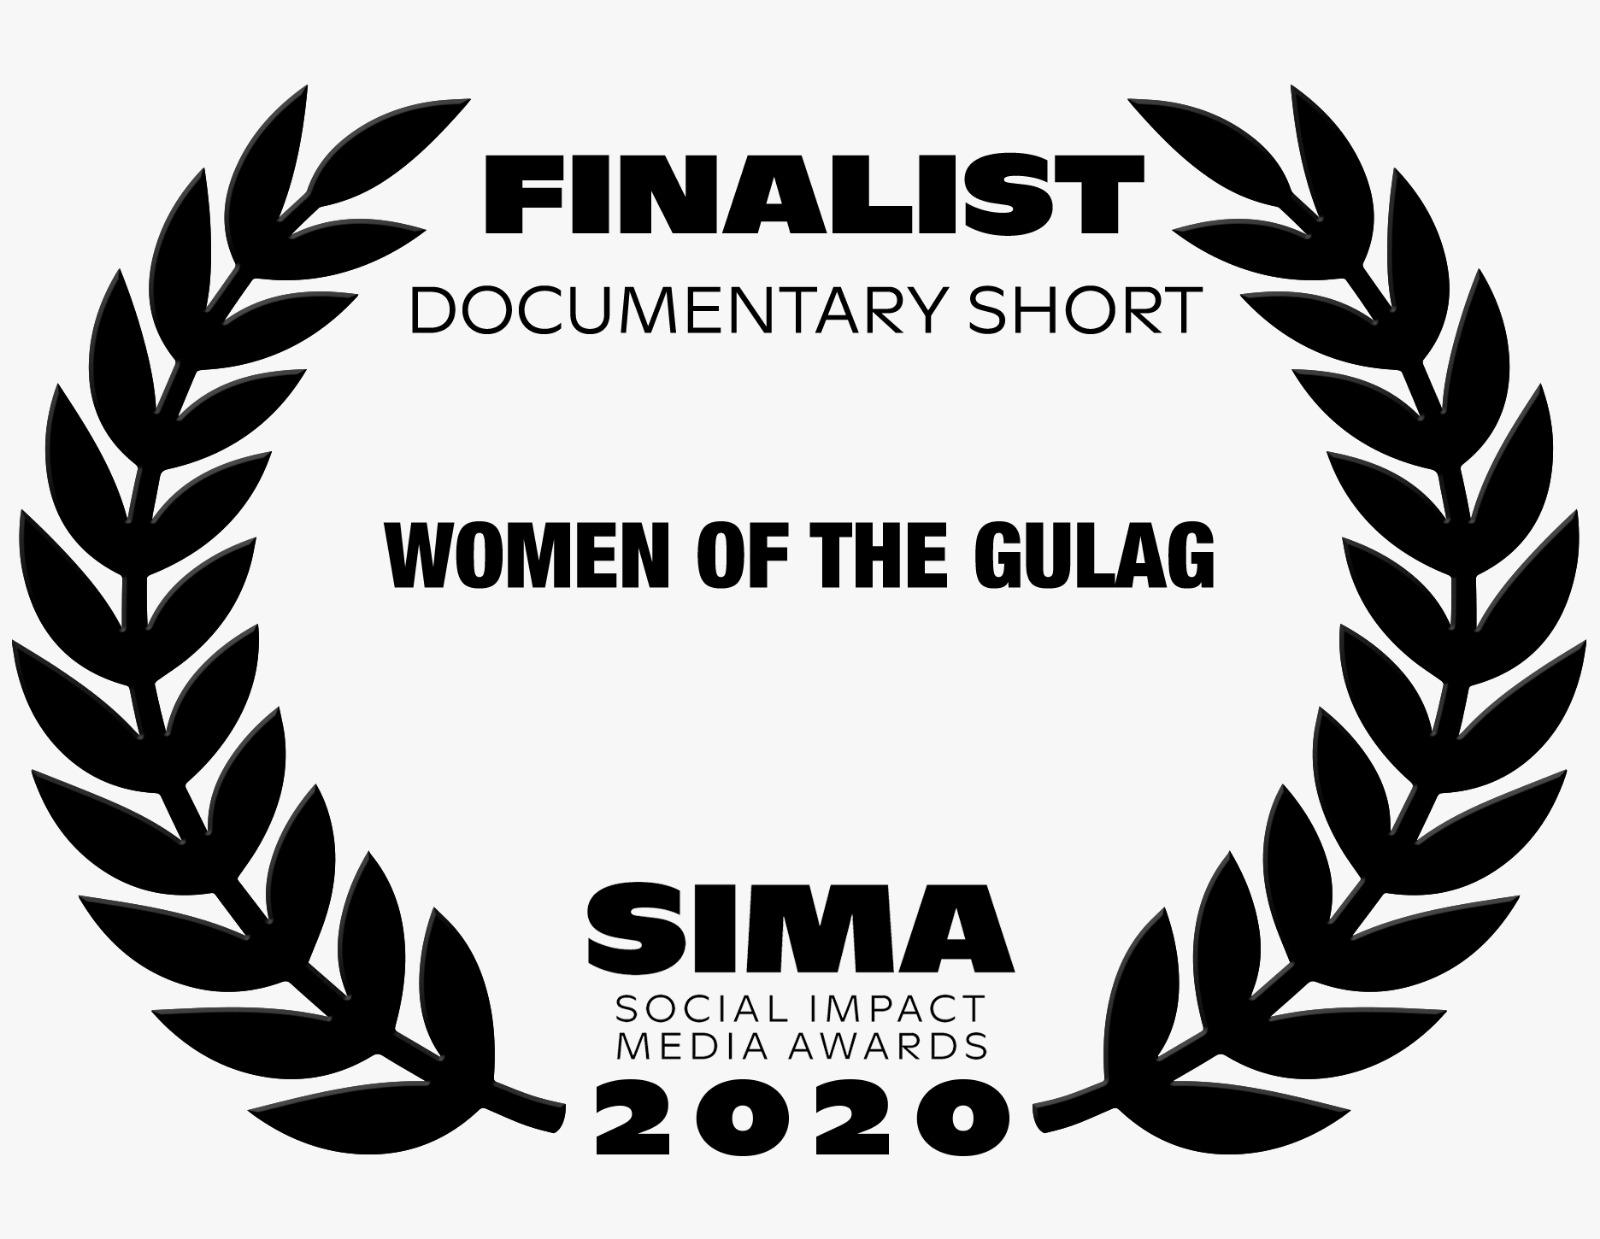 Social Impact Media Awards/ SIMA/ 2019 Finalists